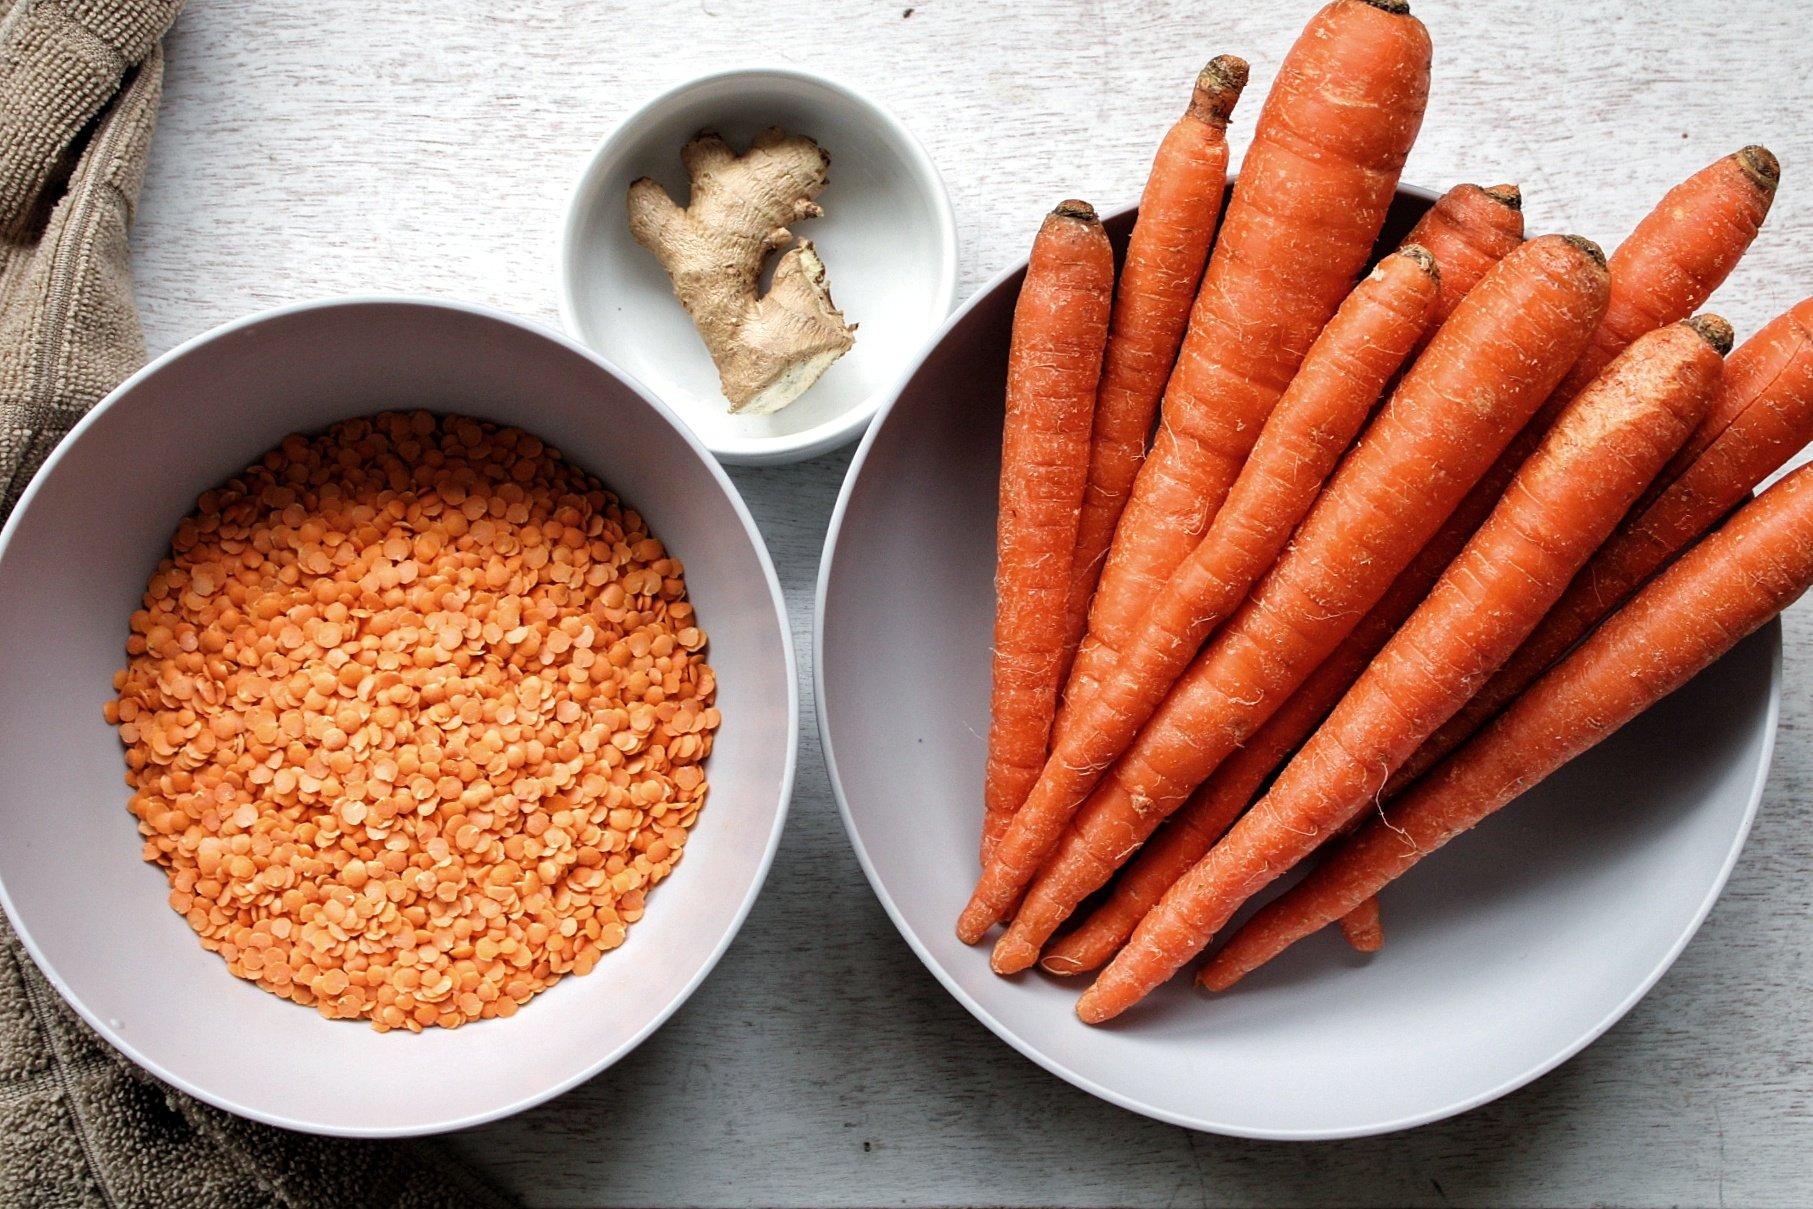 Ingredients for soup: red split lentils, ginger, and carrots